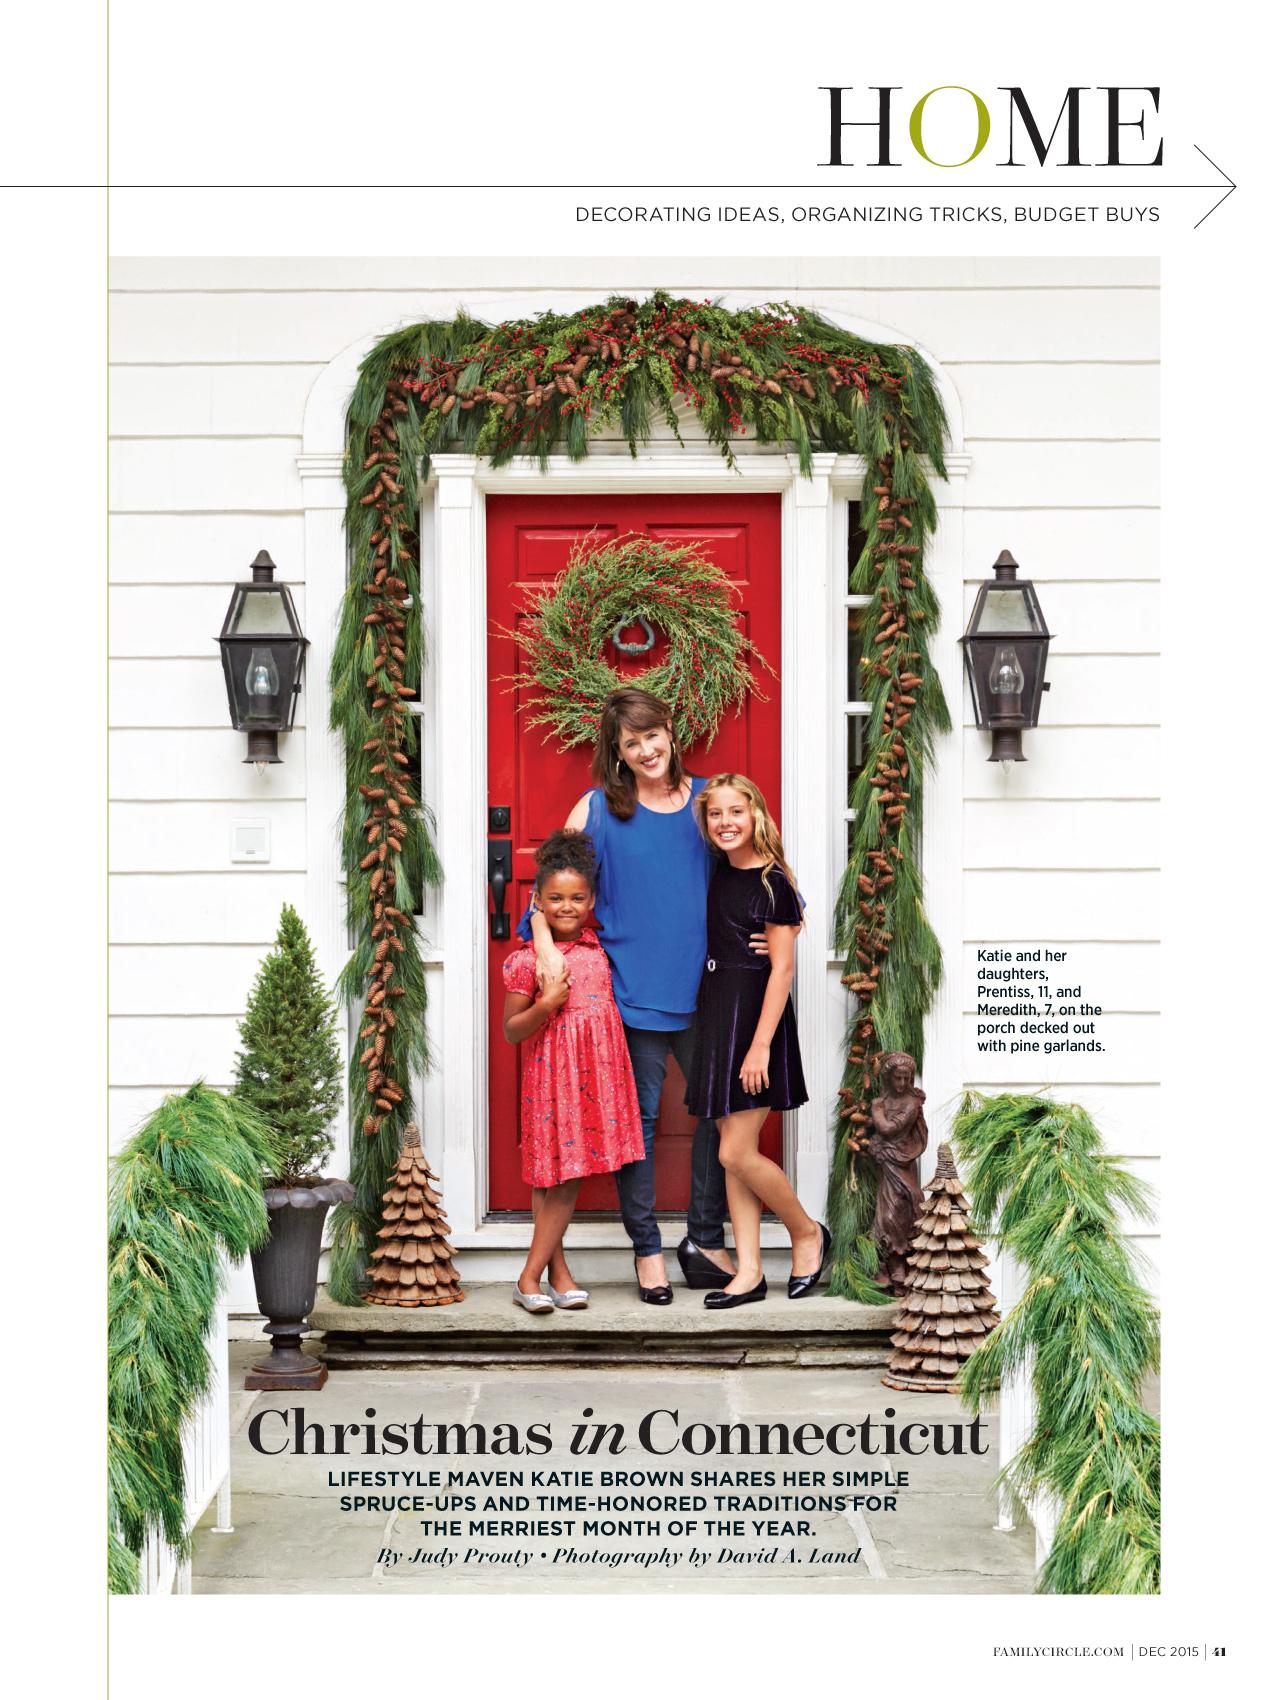 ChristopherWhite-FamilyCircle-holiday2015-1.jpg